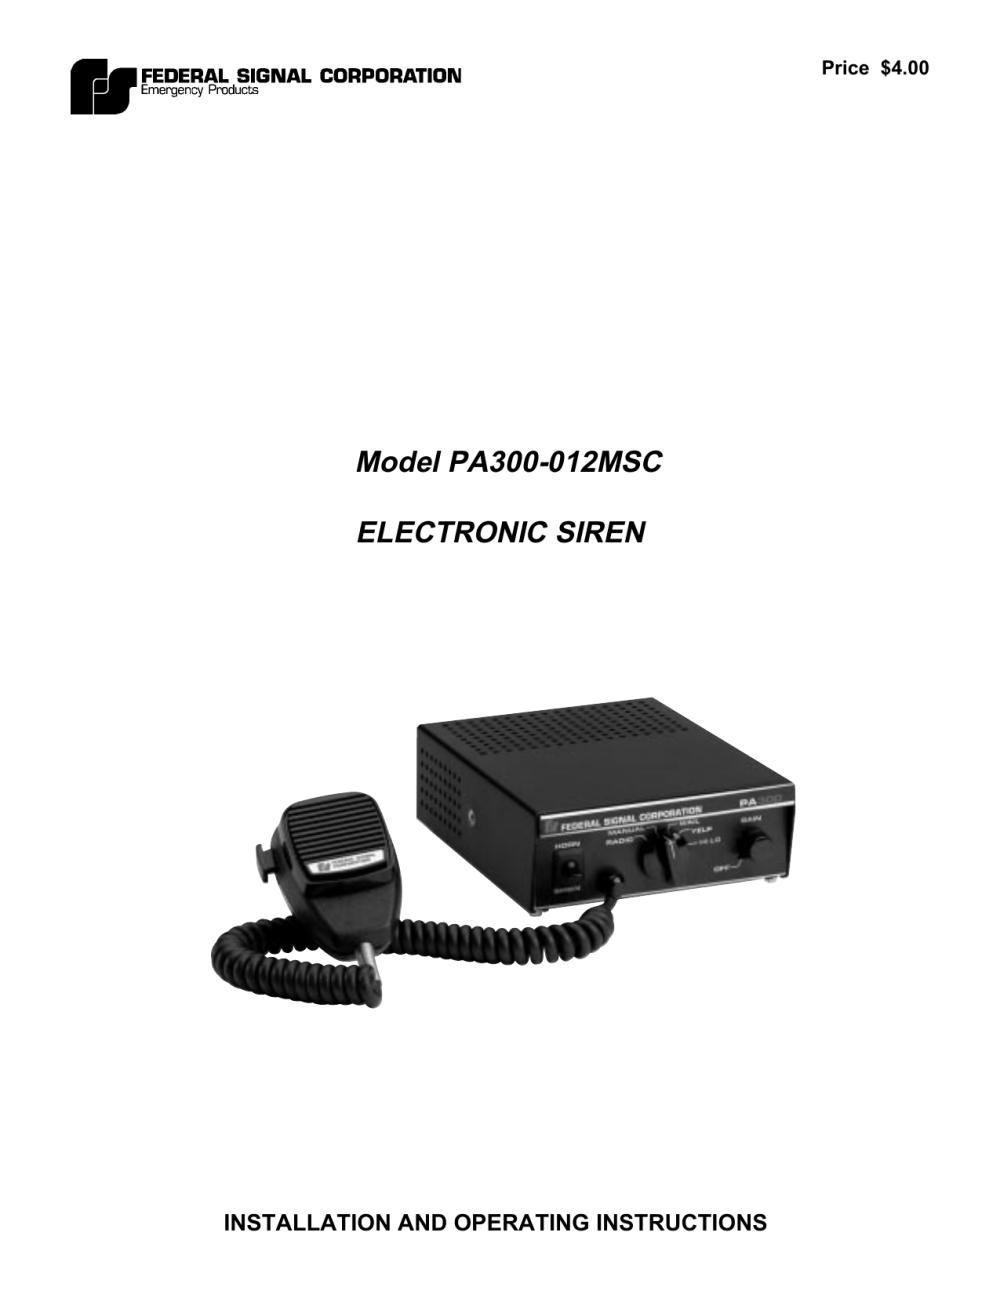 medium resolution of model pa300 012msc electronic siren